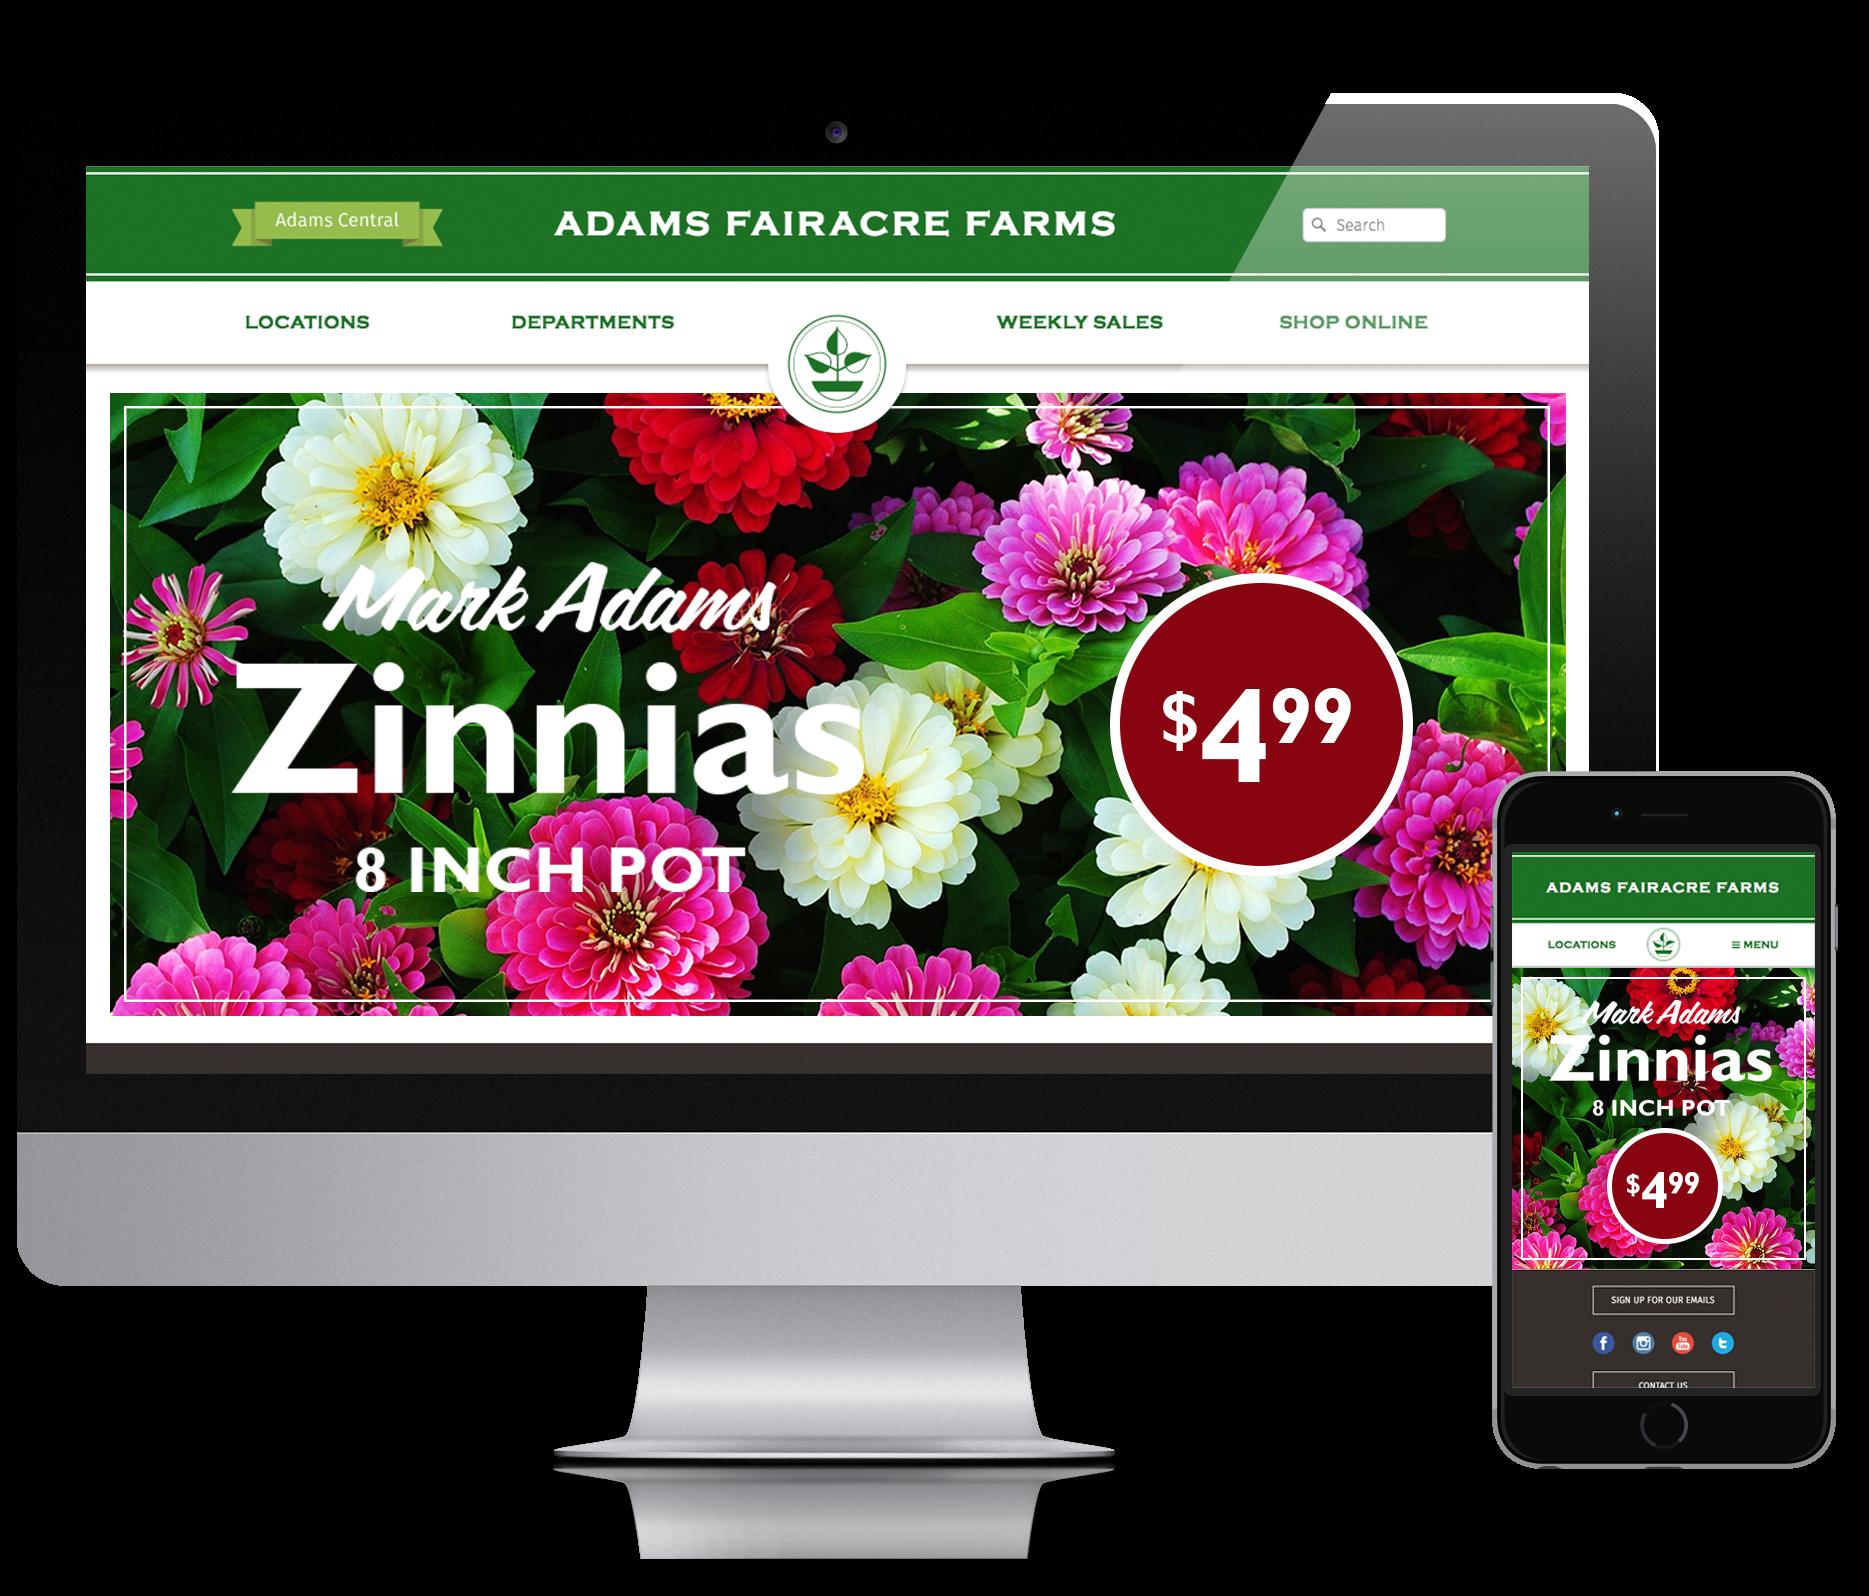 Adams Faireacre Farms Website Home Page